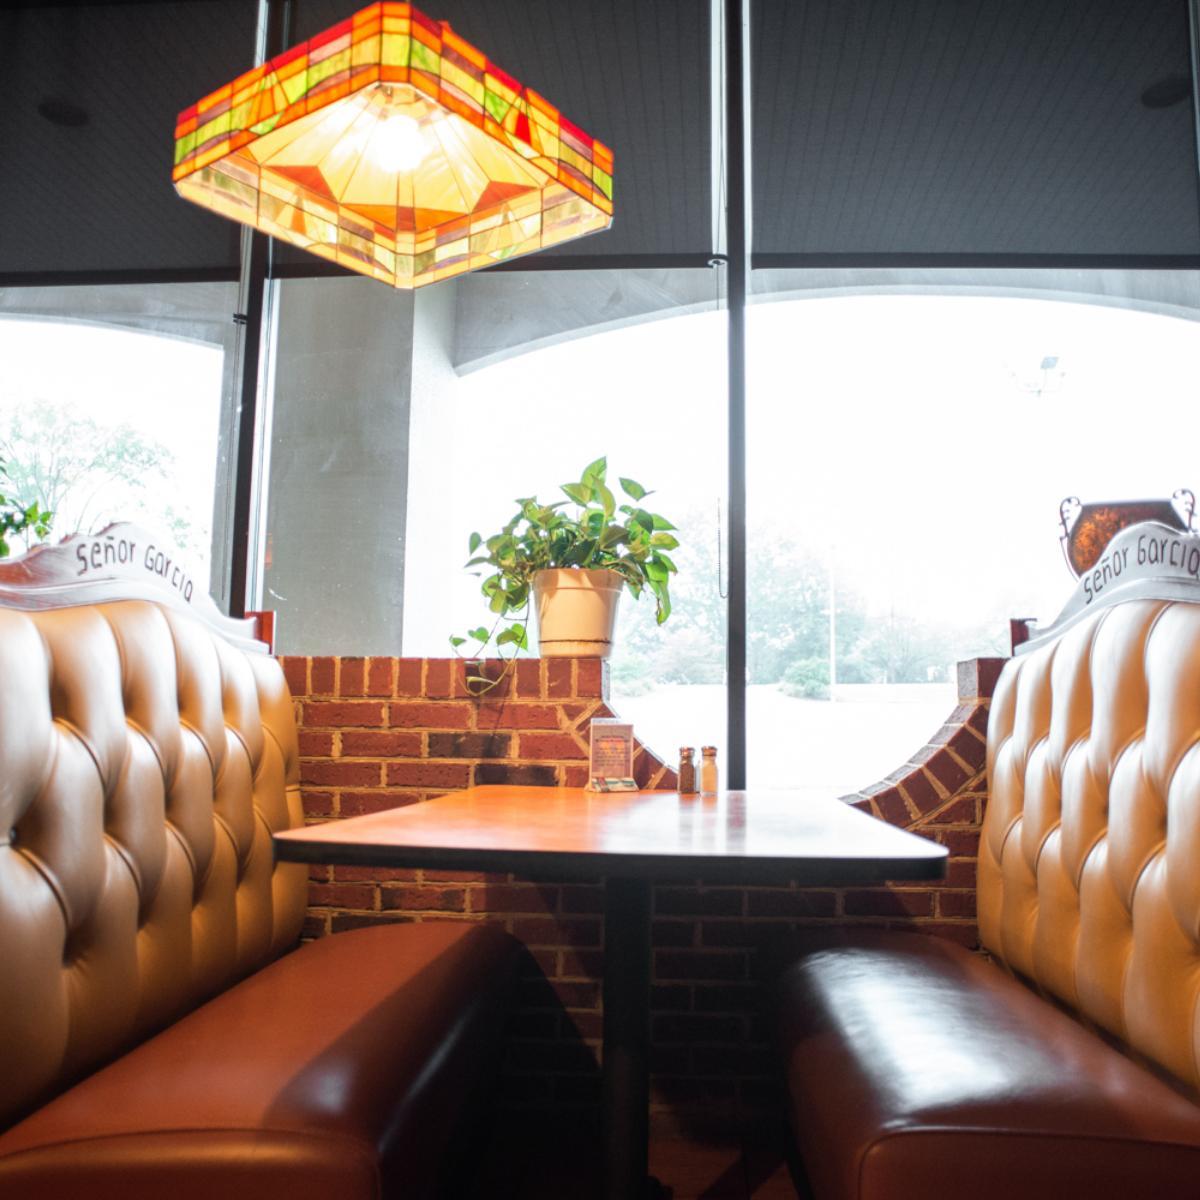 Your seat awaits.<br>http://pic.twitter.com/7MFXoIS0eN